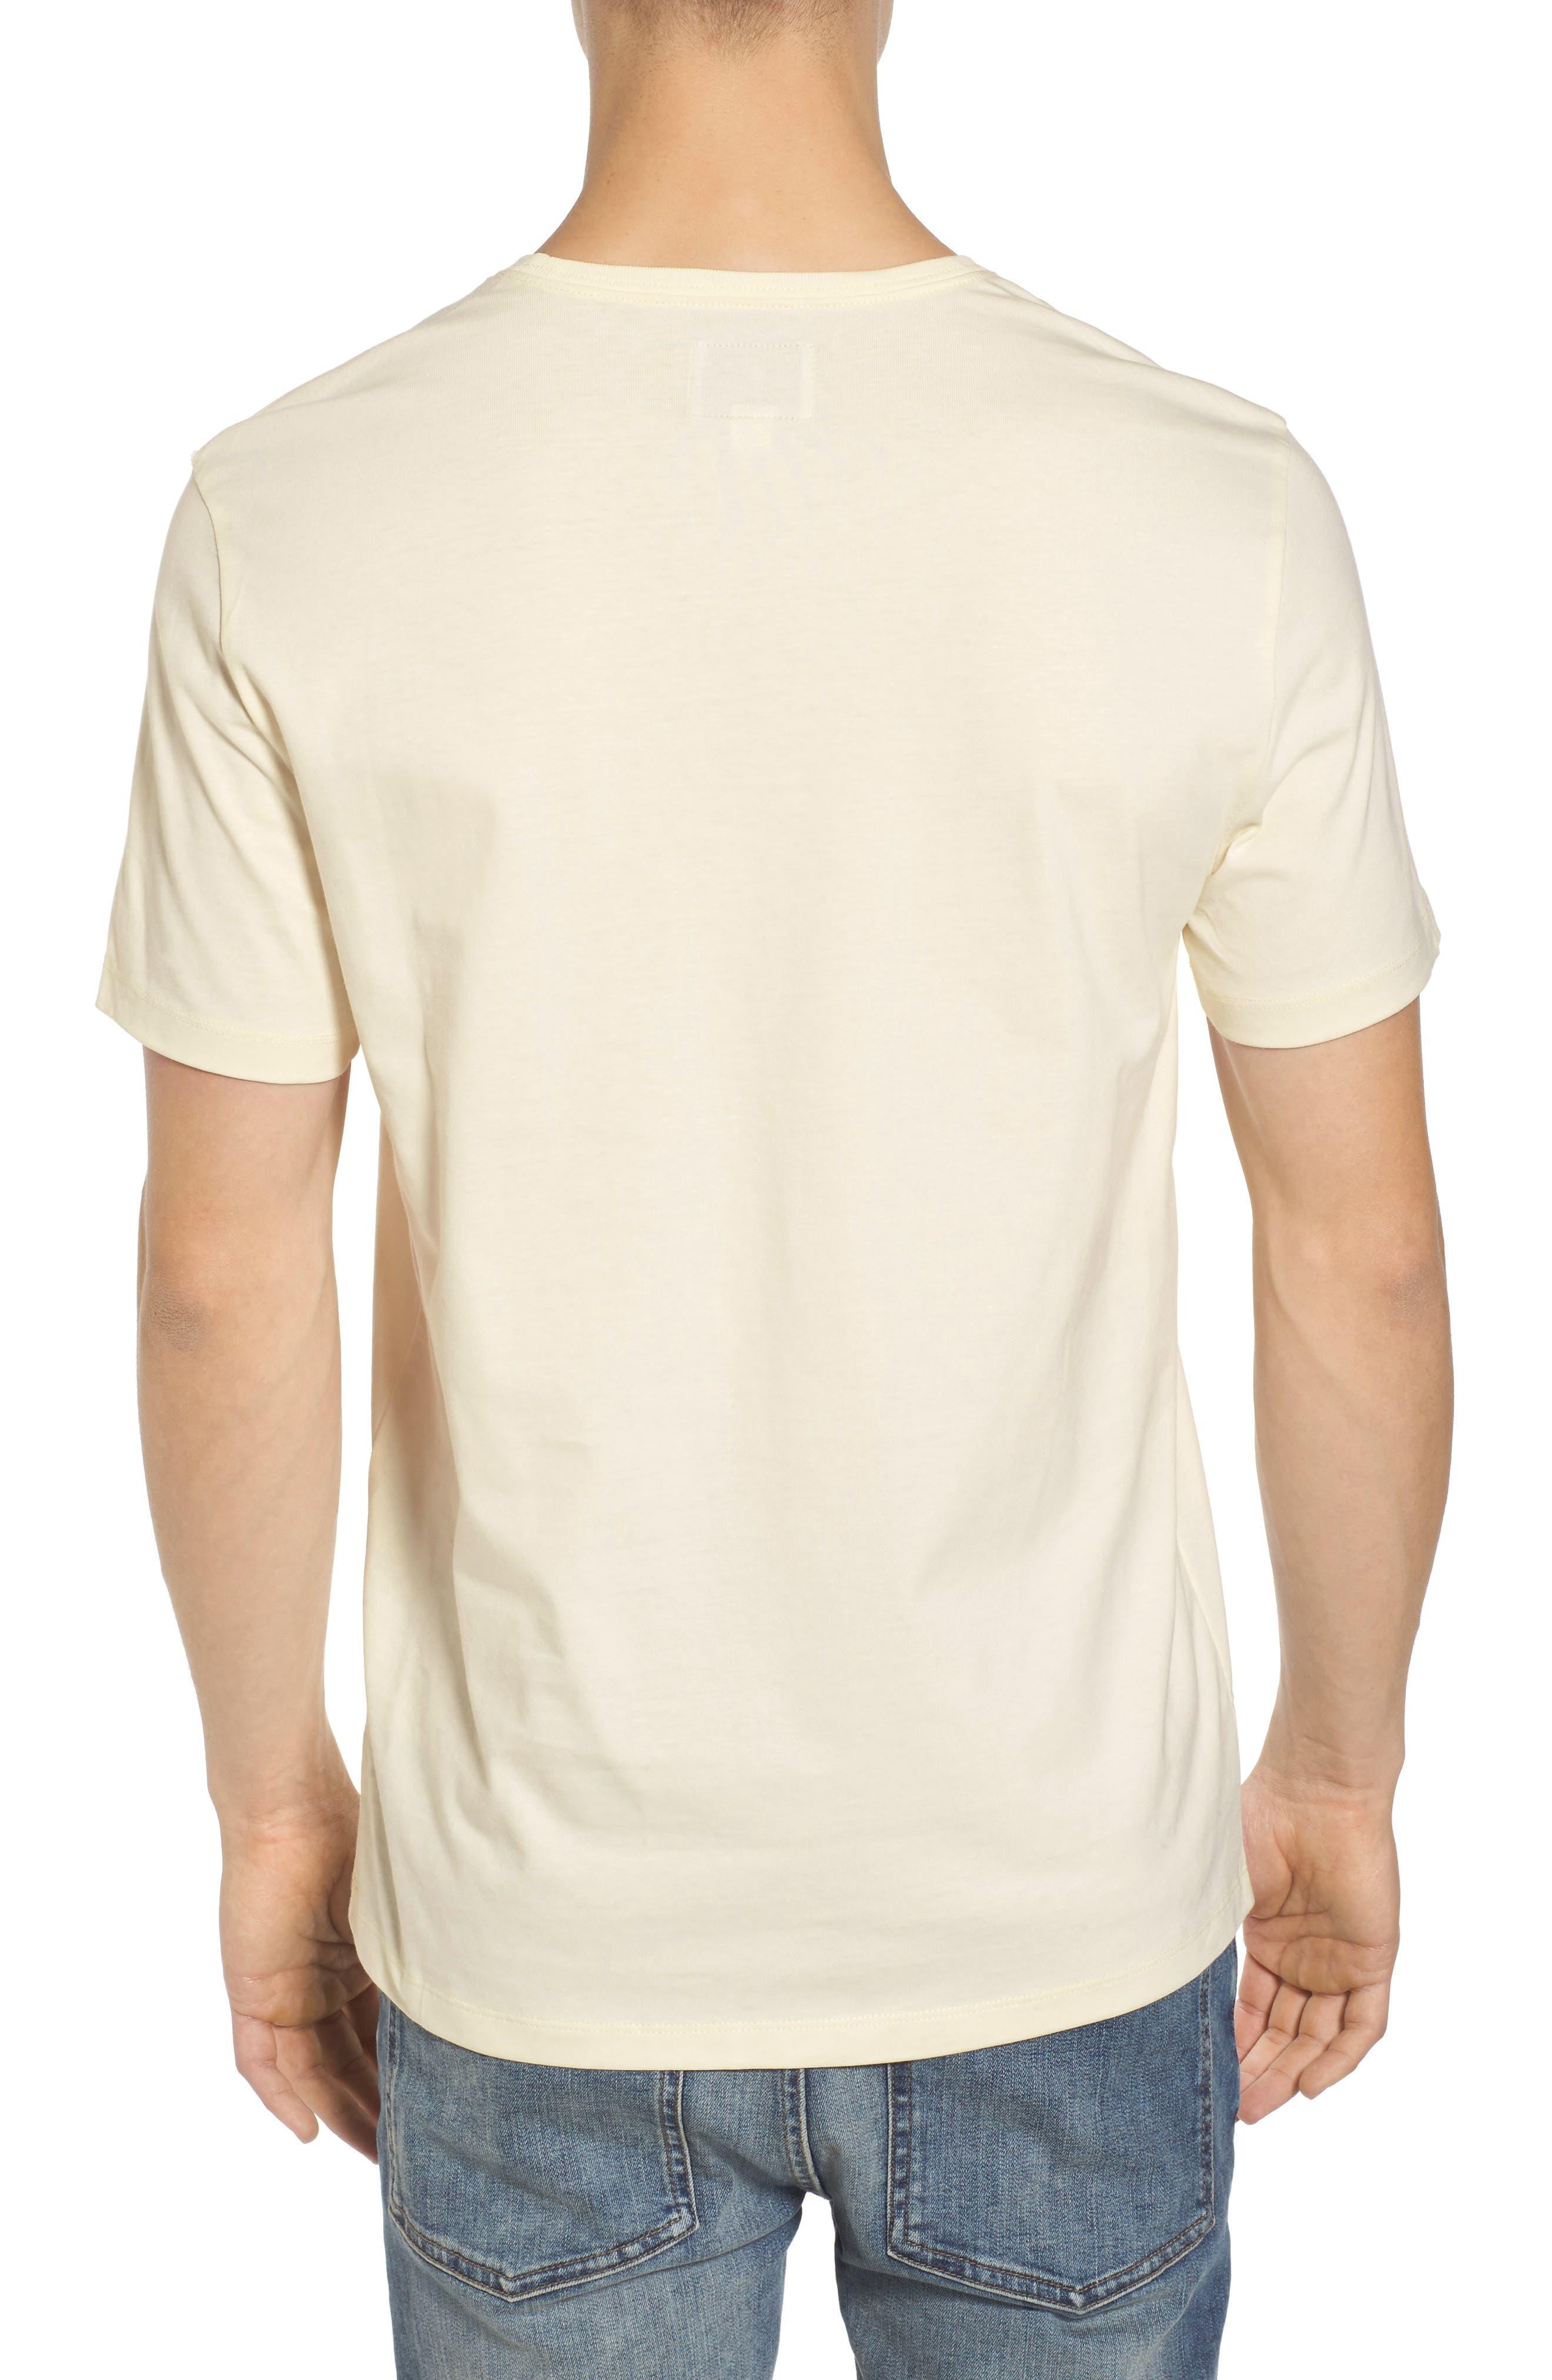 Label Pocket T-Shirt,                             Alternate thumbnail 2, color,